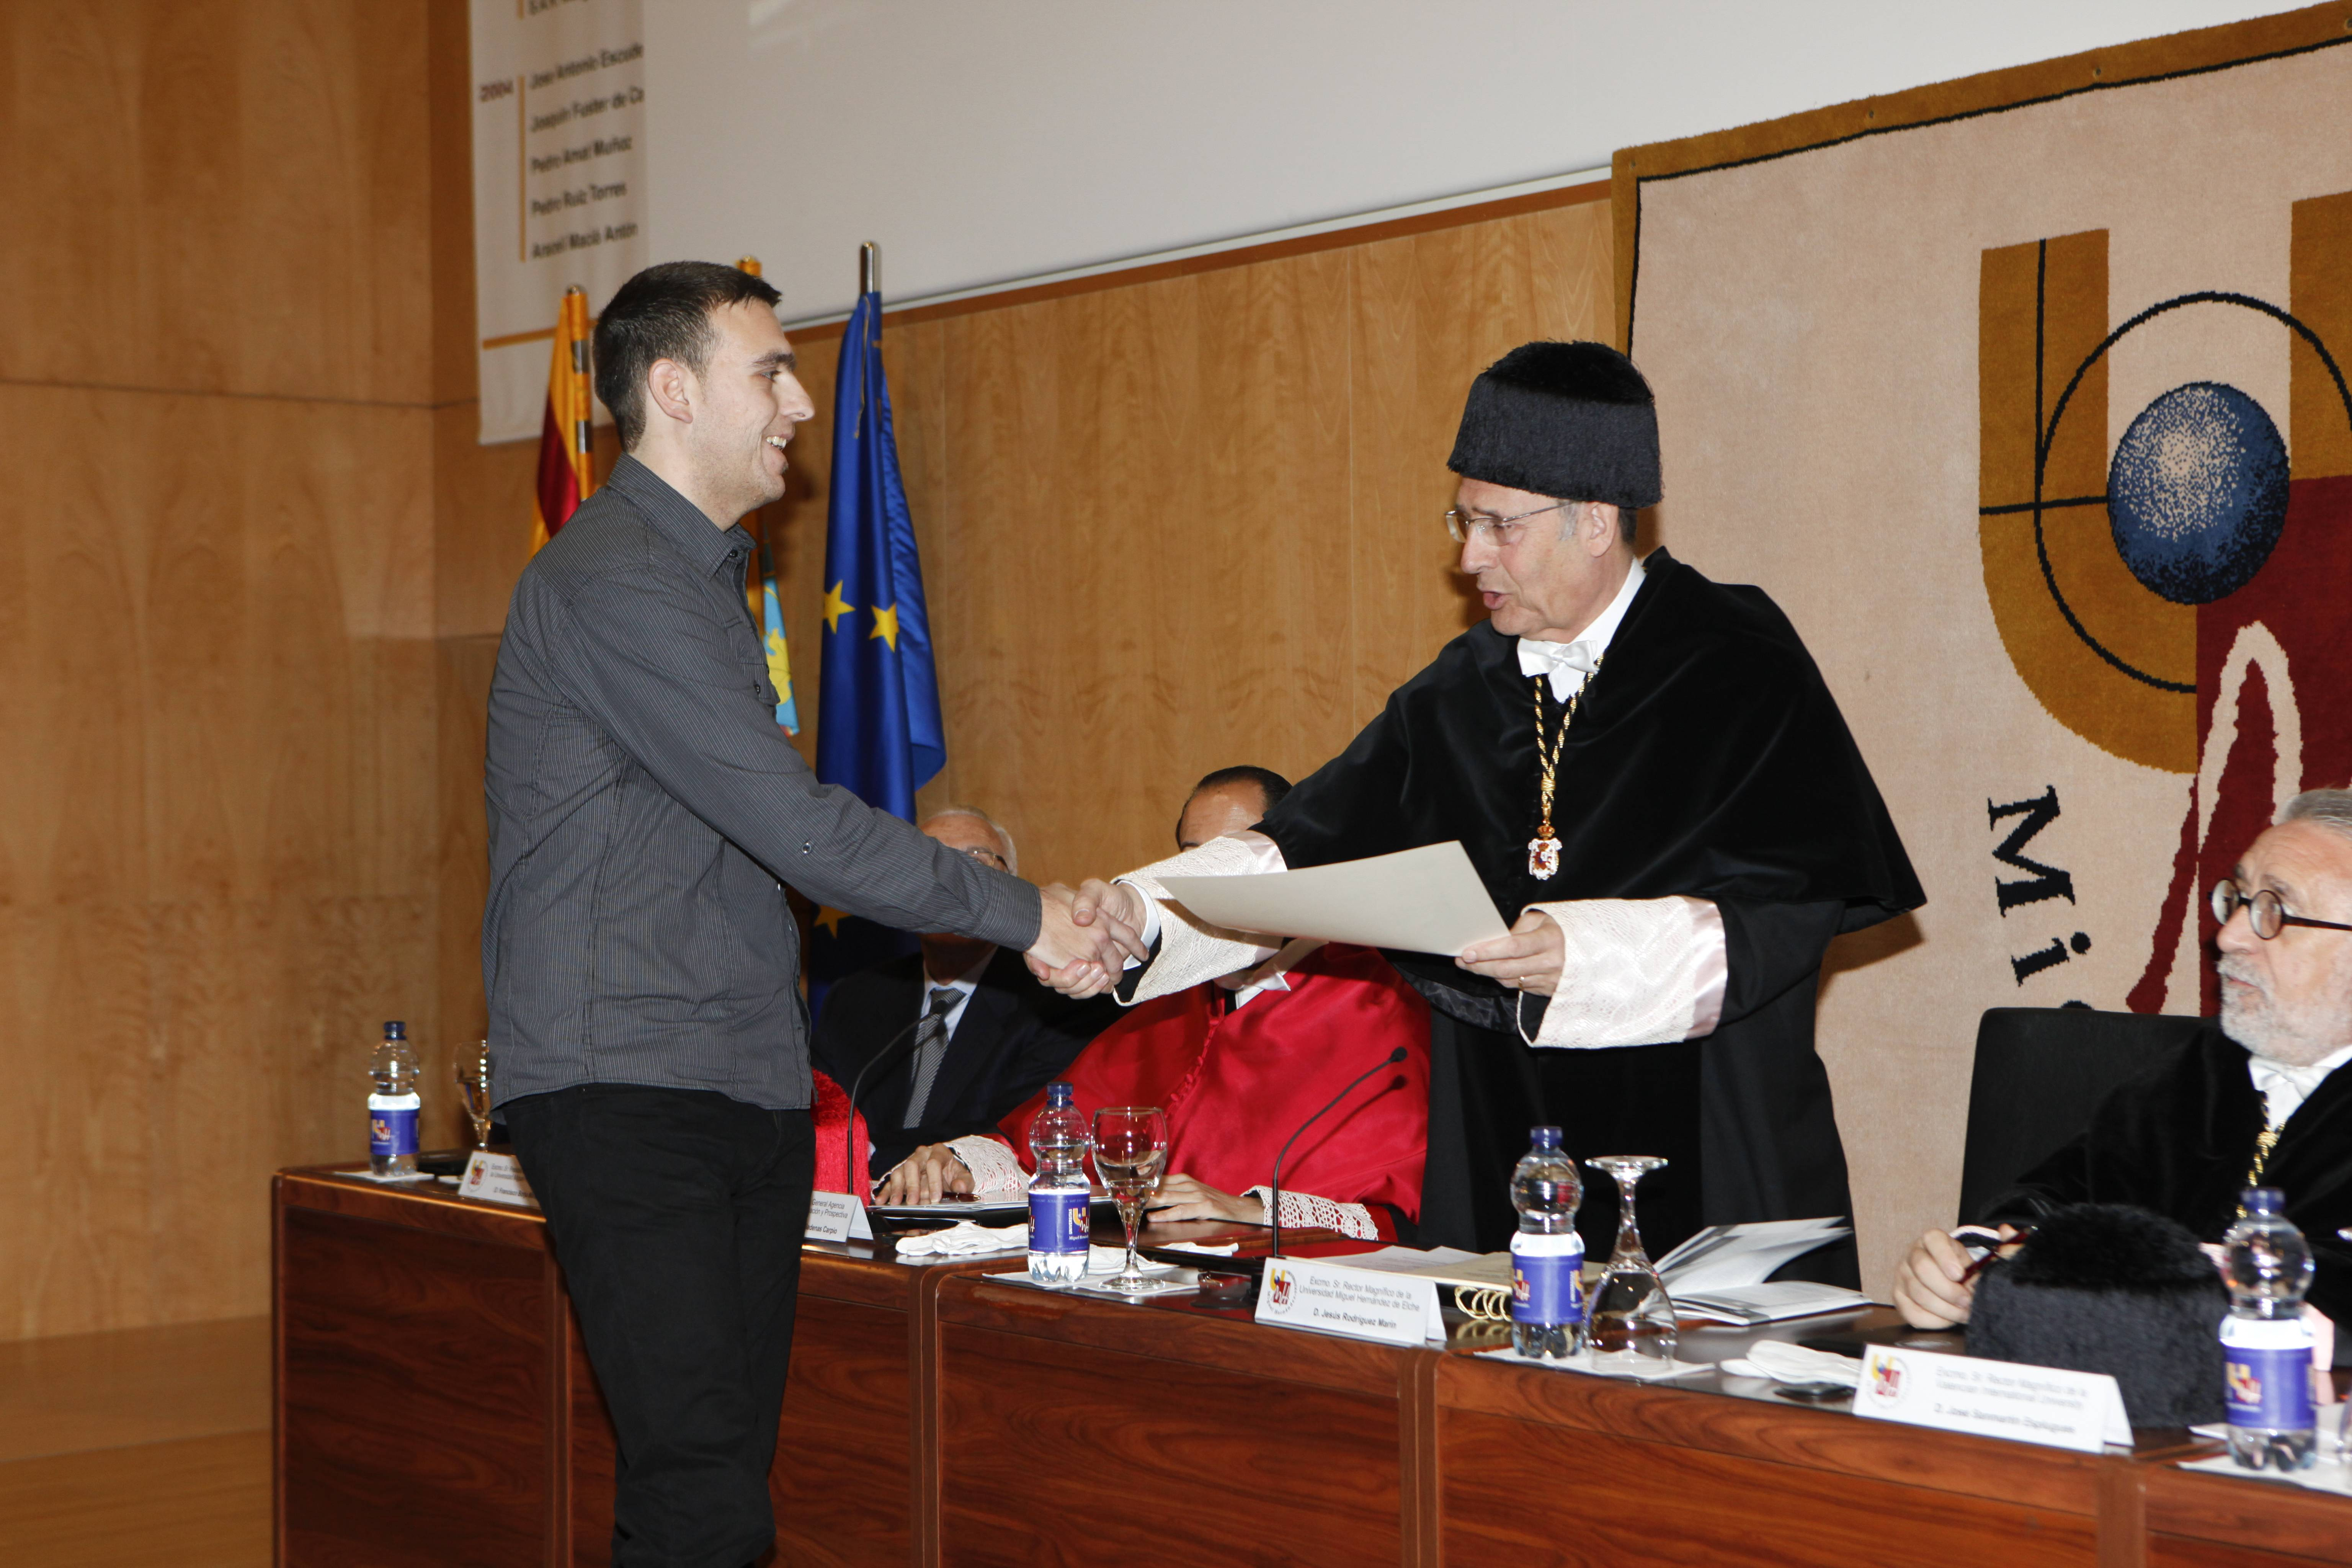 doctor-honoris-causa-luis-gamir_mg_0914.jpg